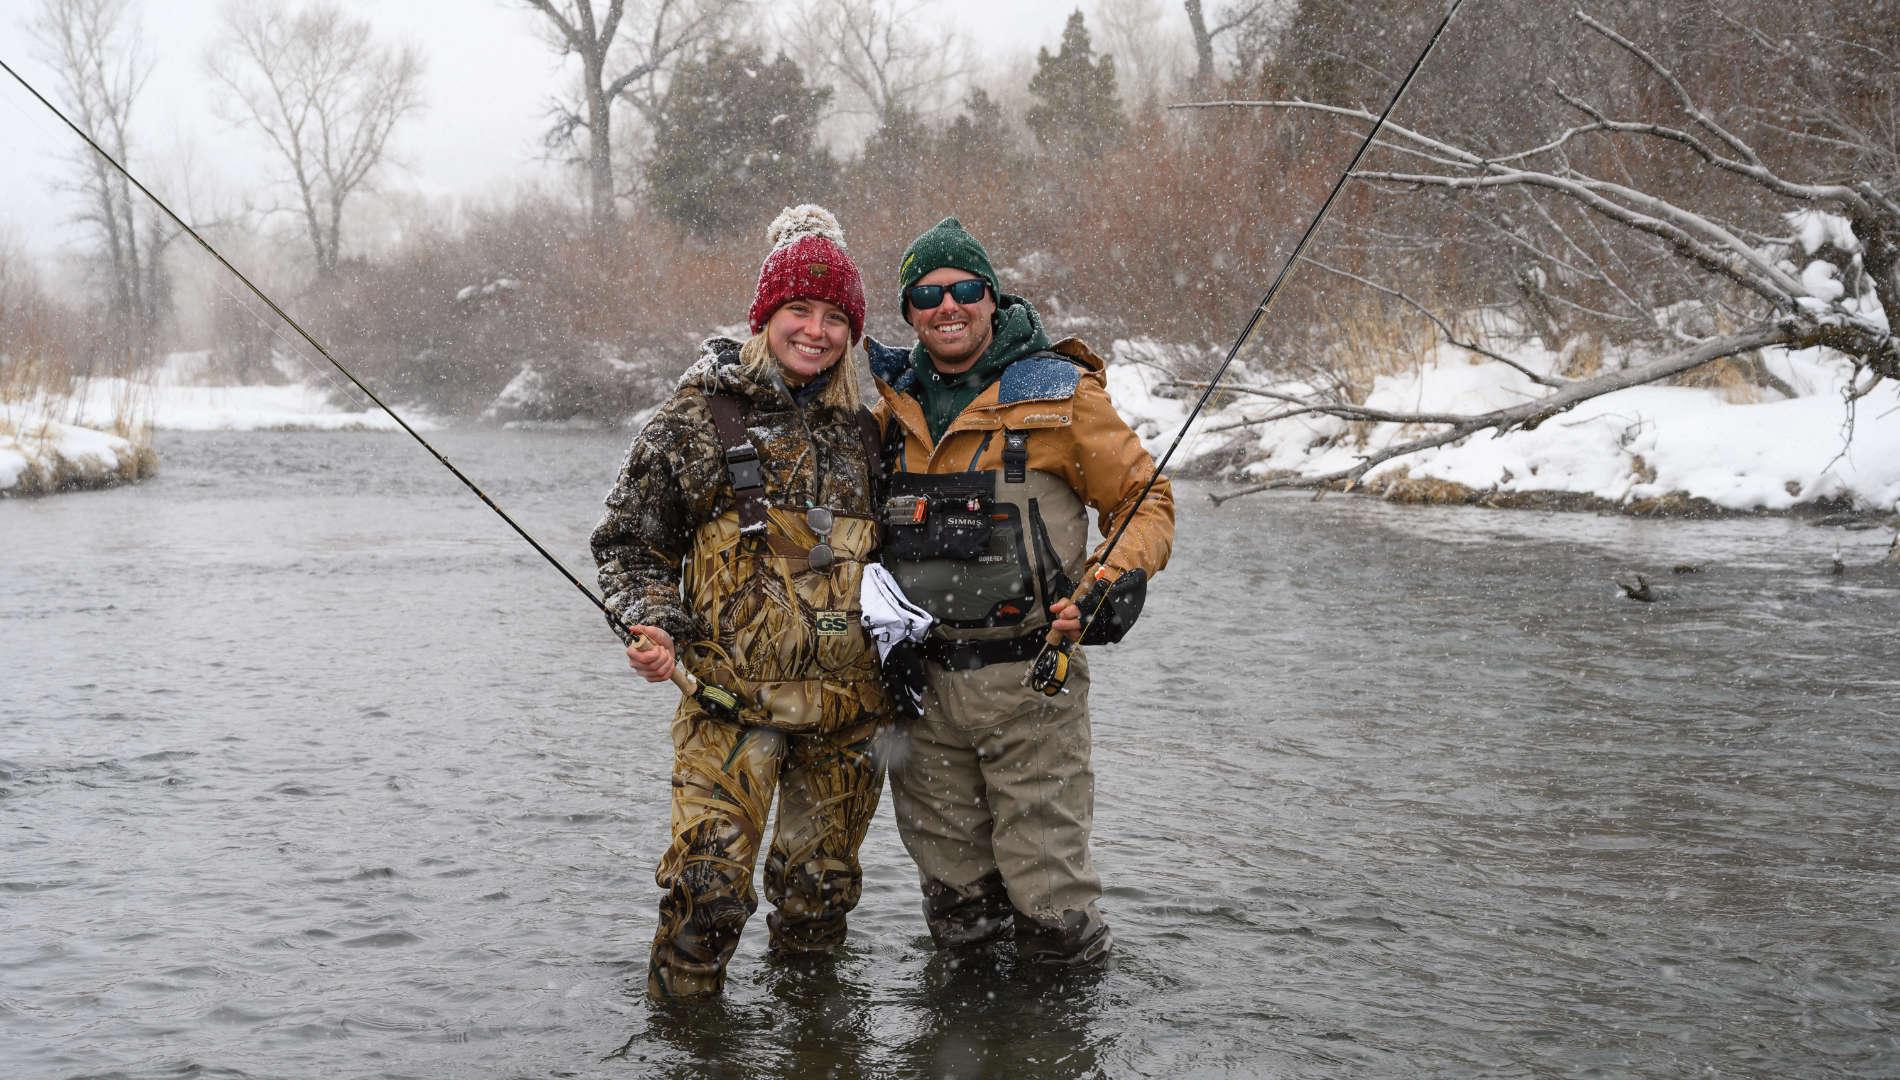 Winter Spring Creek Fly Fishing Trips - Montana Angling ...